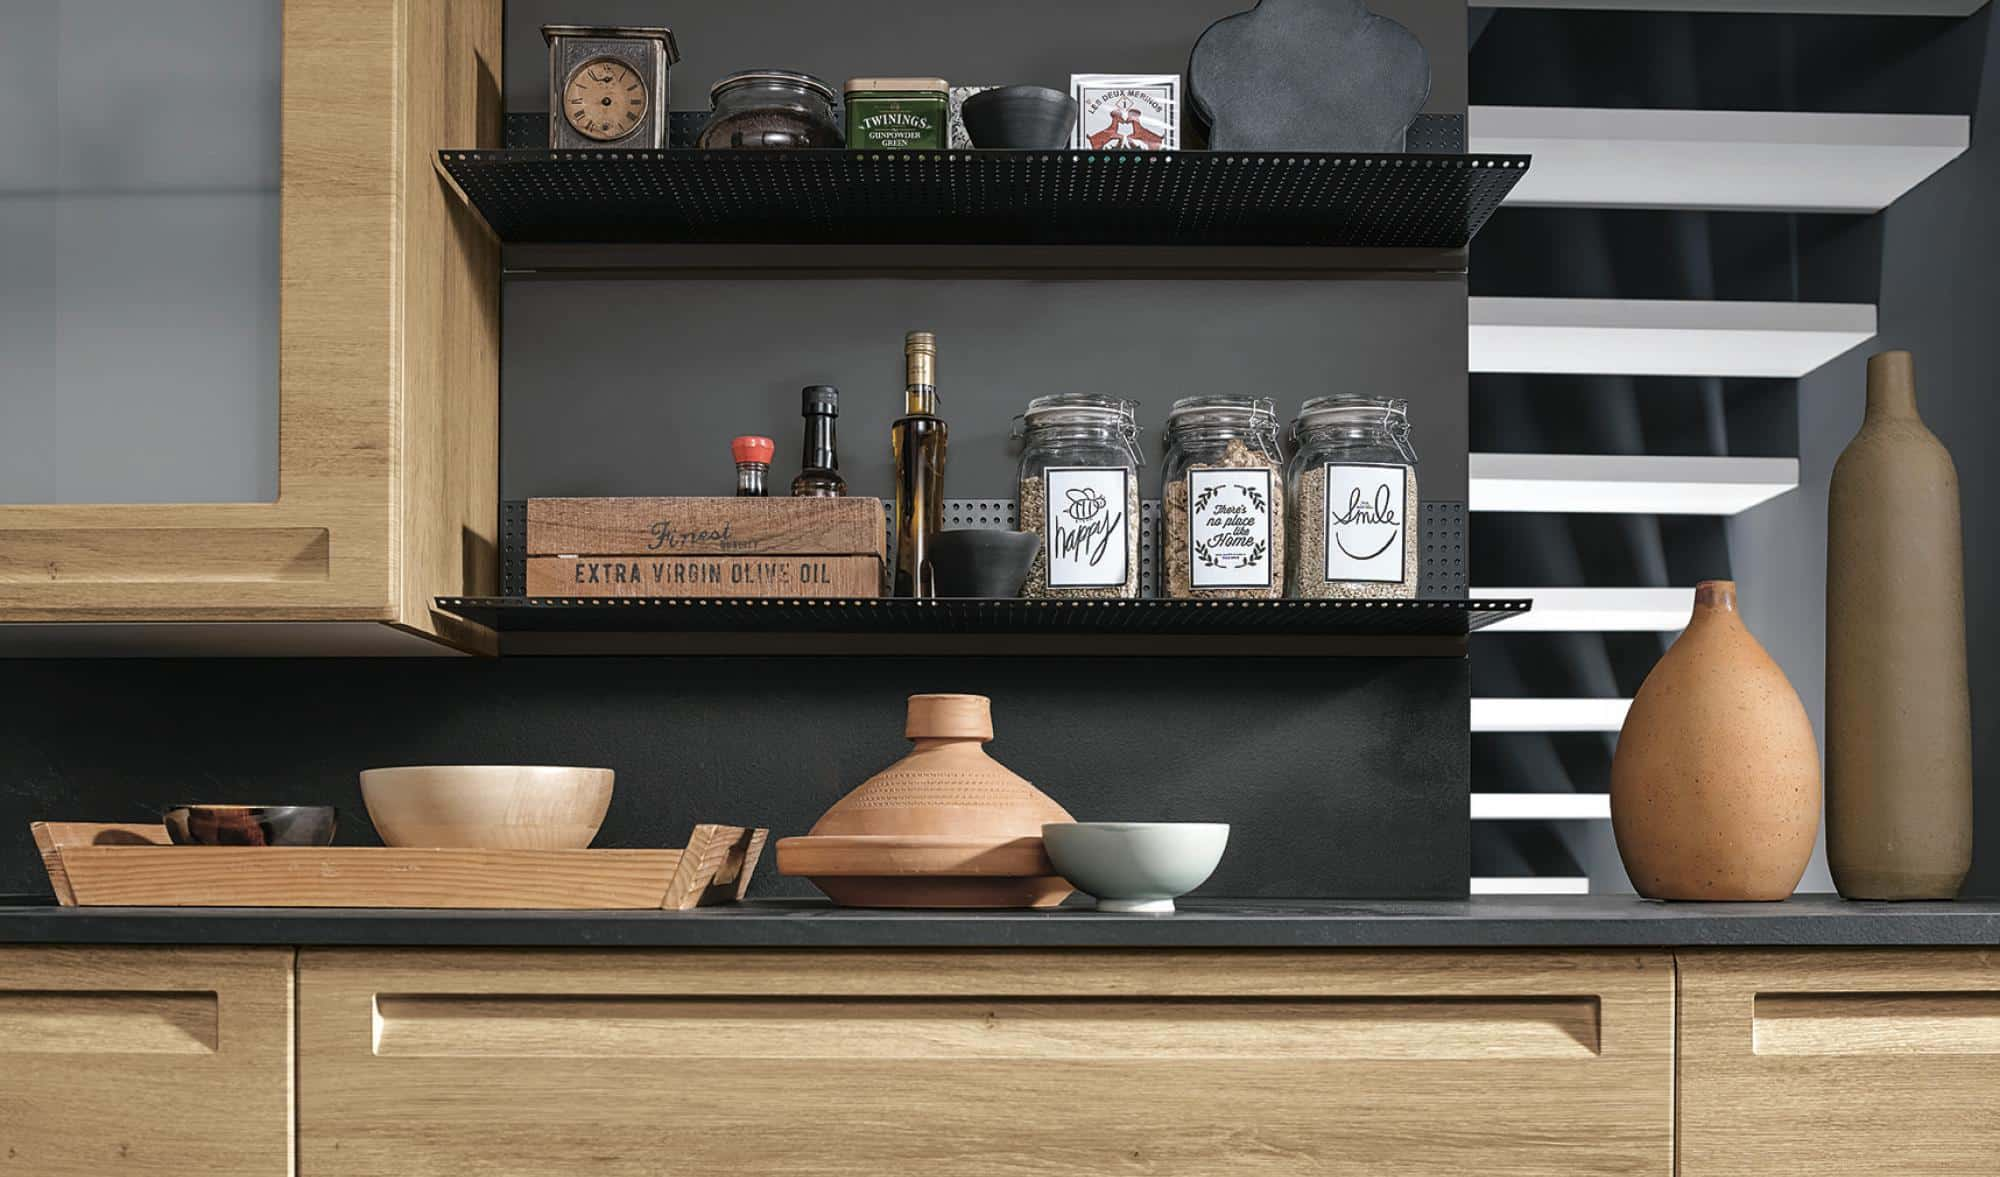 Isla κουζινα φυσικο και γκρι χρωματισμο πολυμερικο με ενσωματωμενη λαβη και ρετρο υφος λεπτομερειες